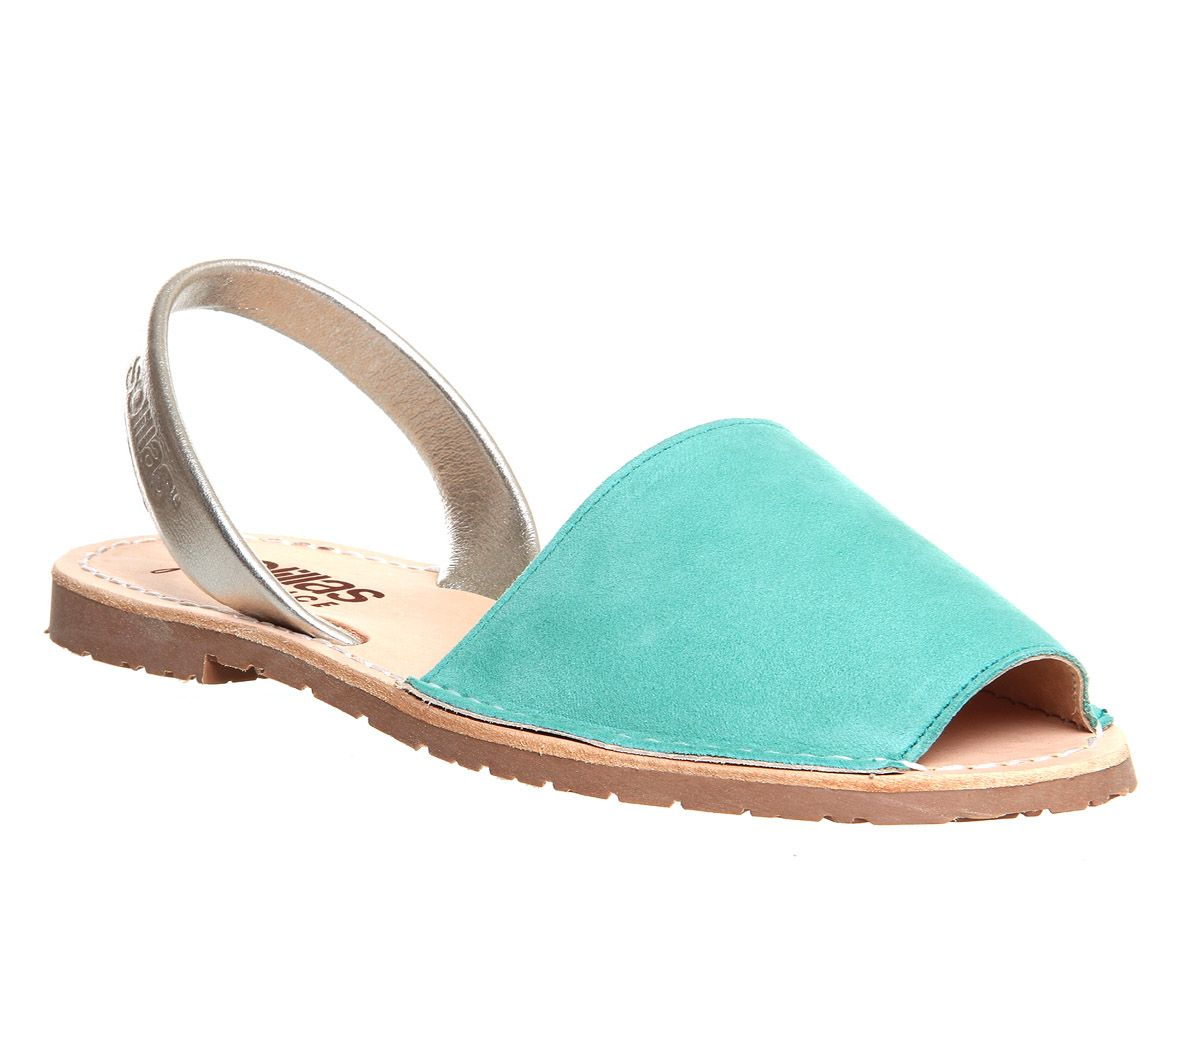 Solillas Solillas Sandal Turquoise Silver - Sandals